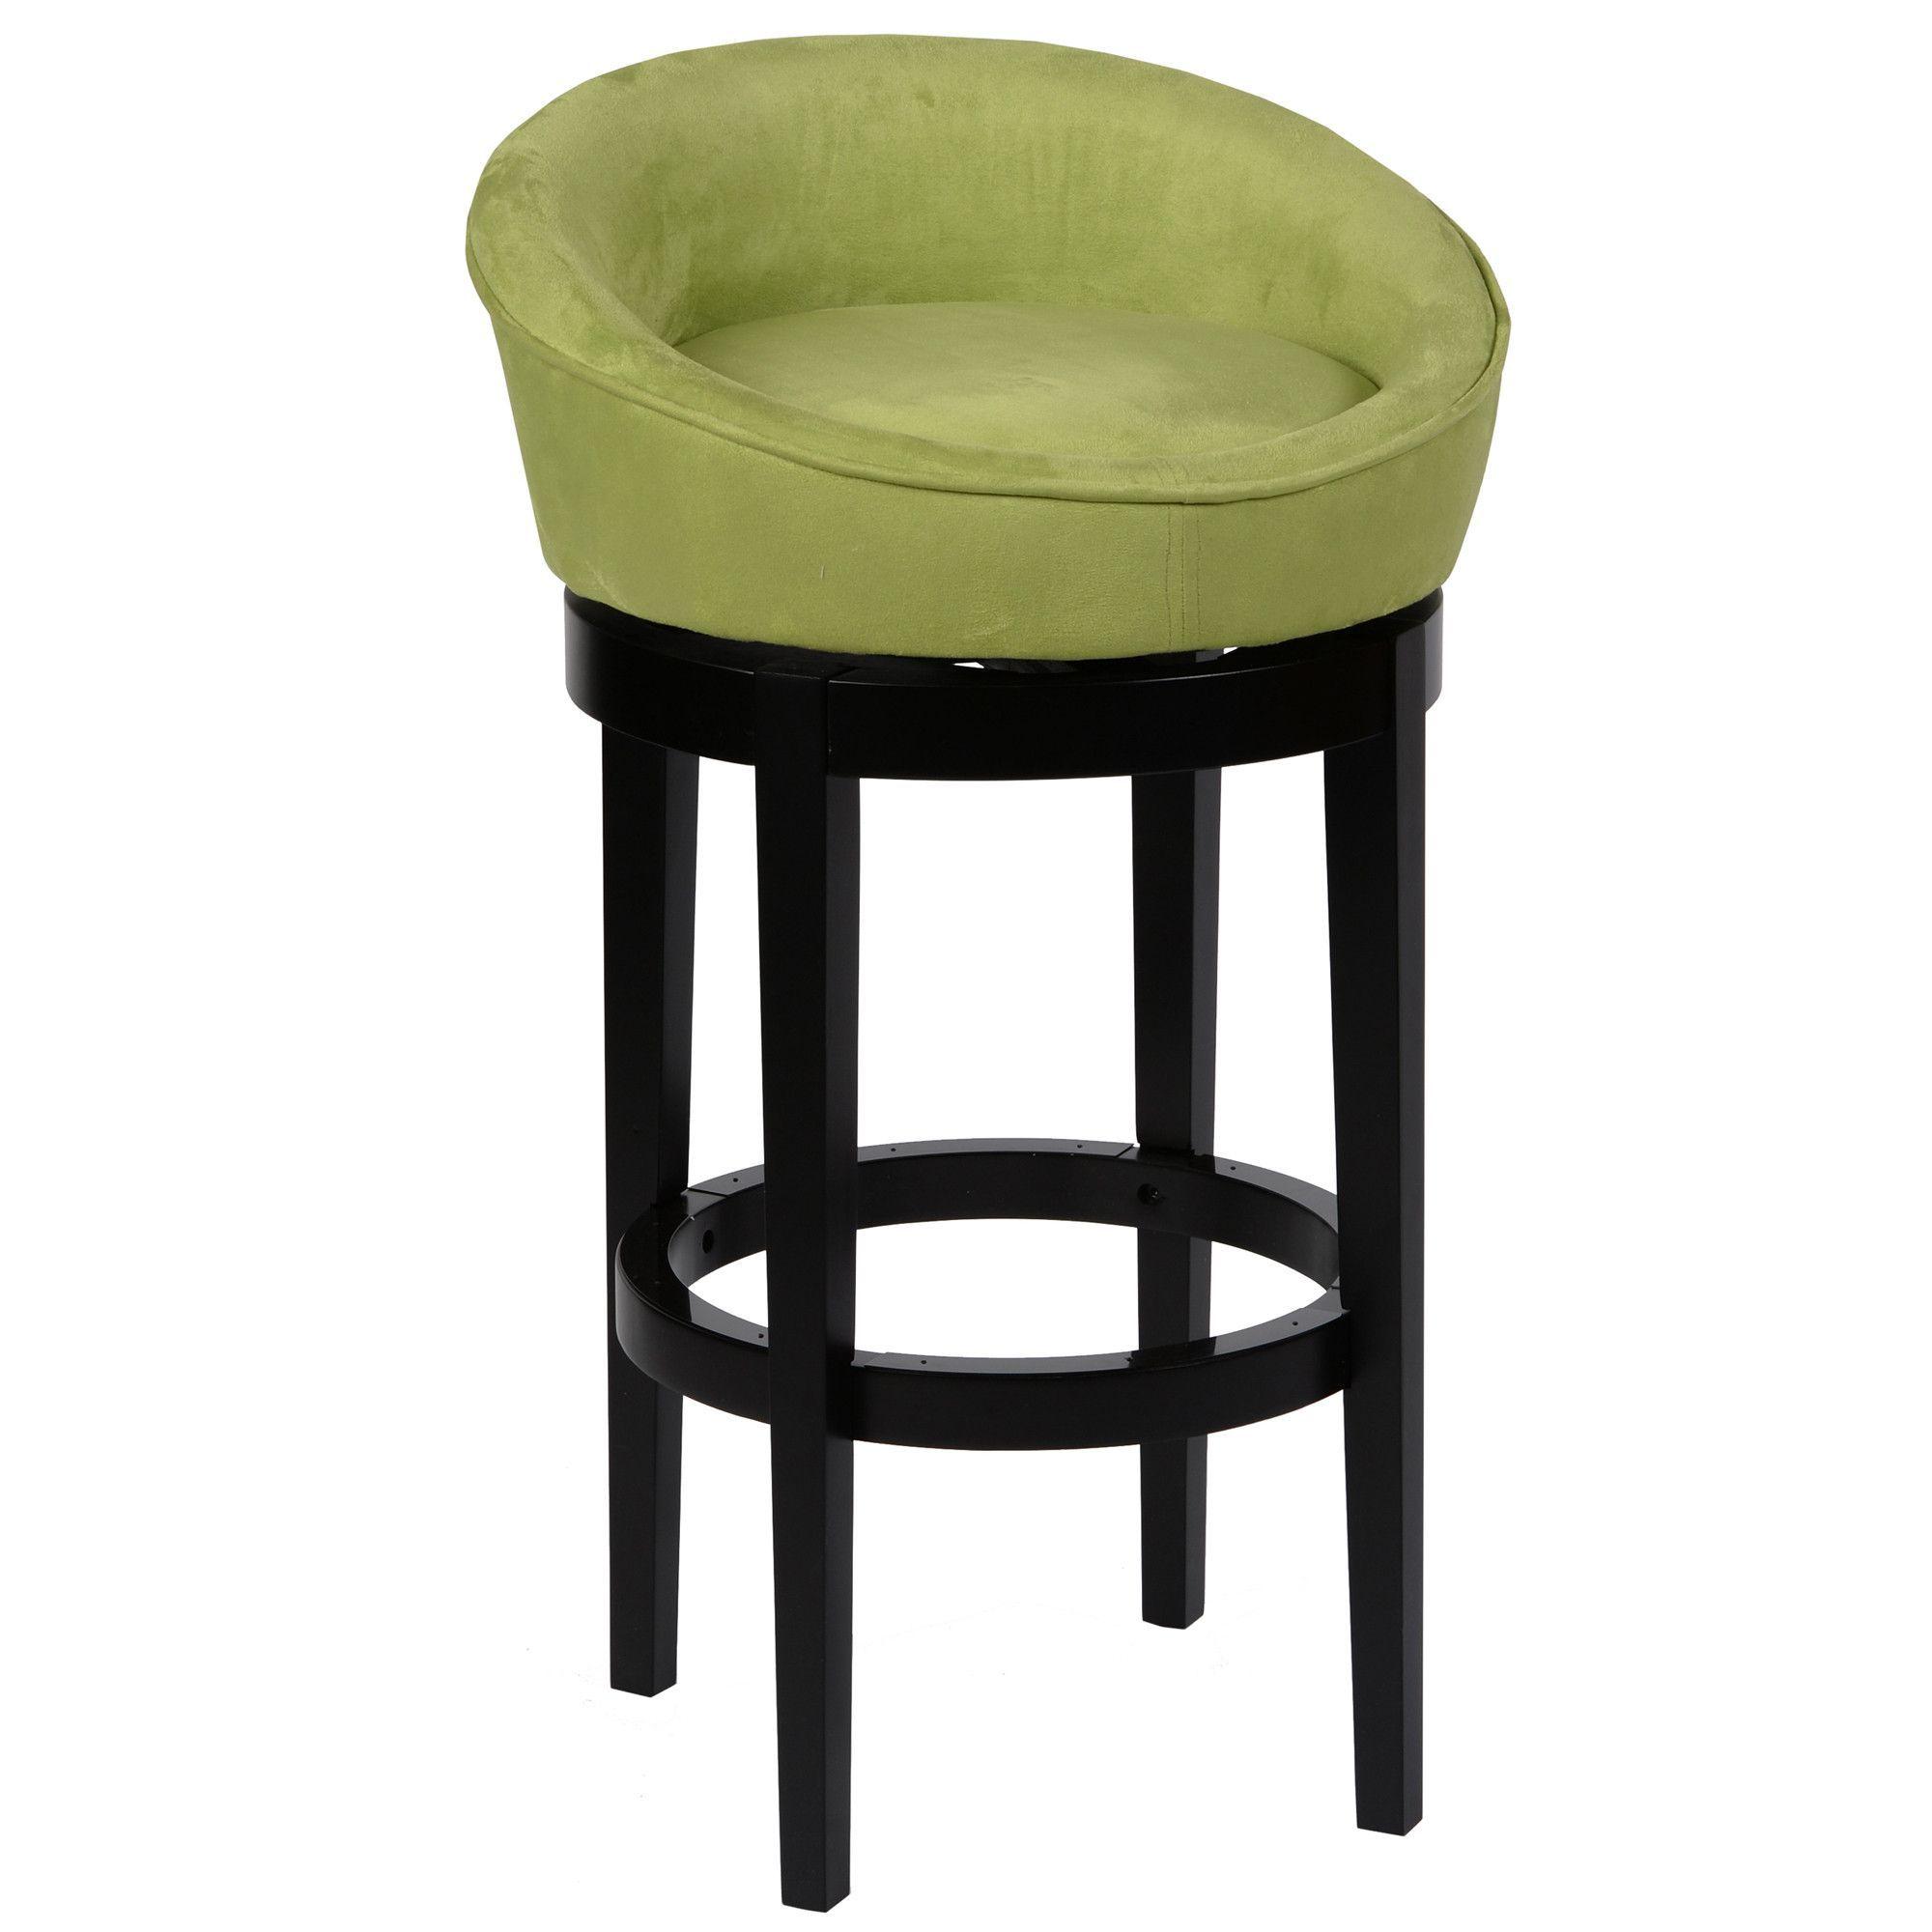 Igloo Green Microfiber 30 Swivel Barstool With Ebony Finished Legs Bar Stools Swivel Bar Stools Swivel Counter